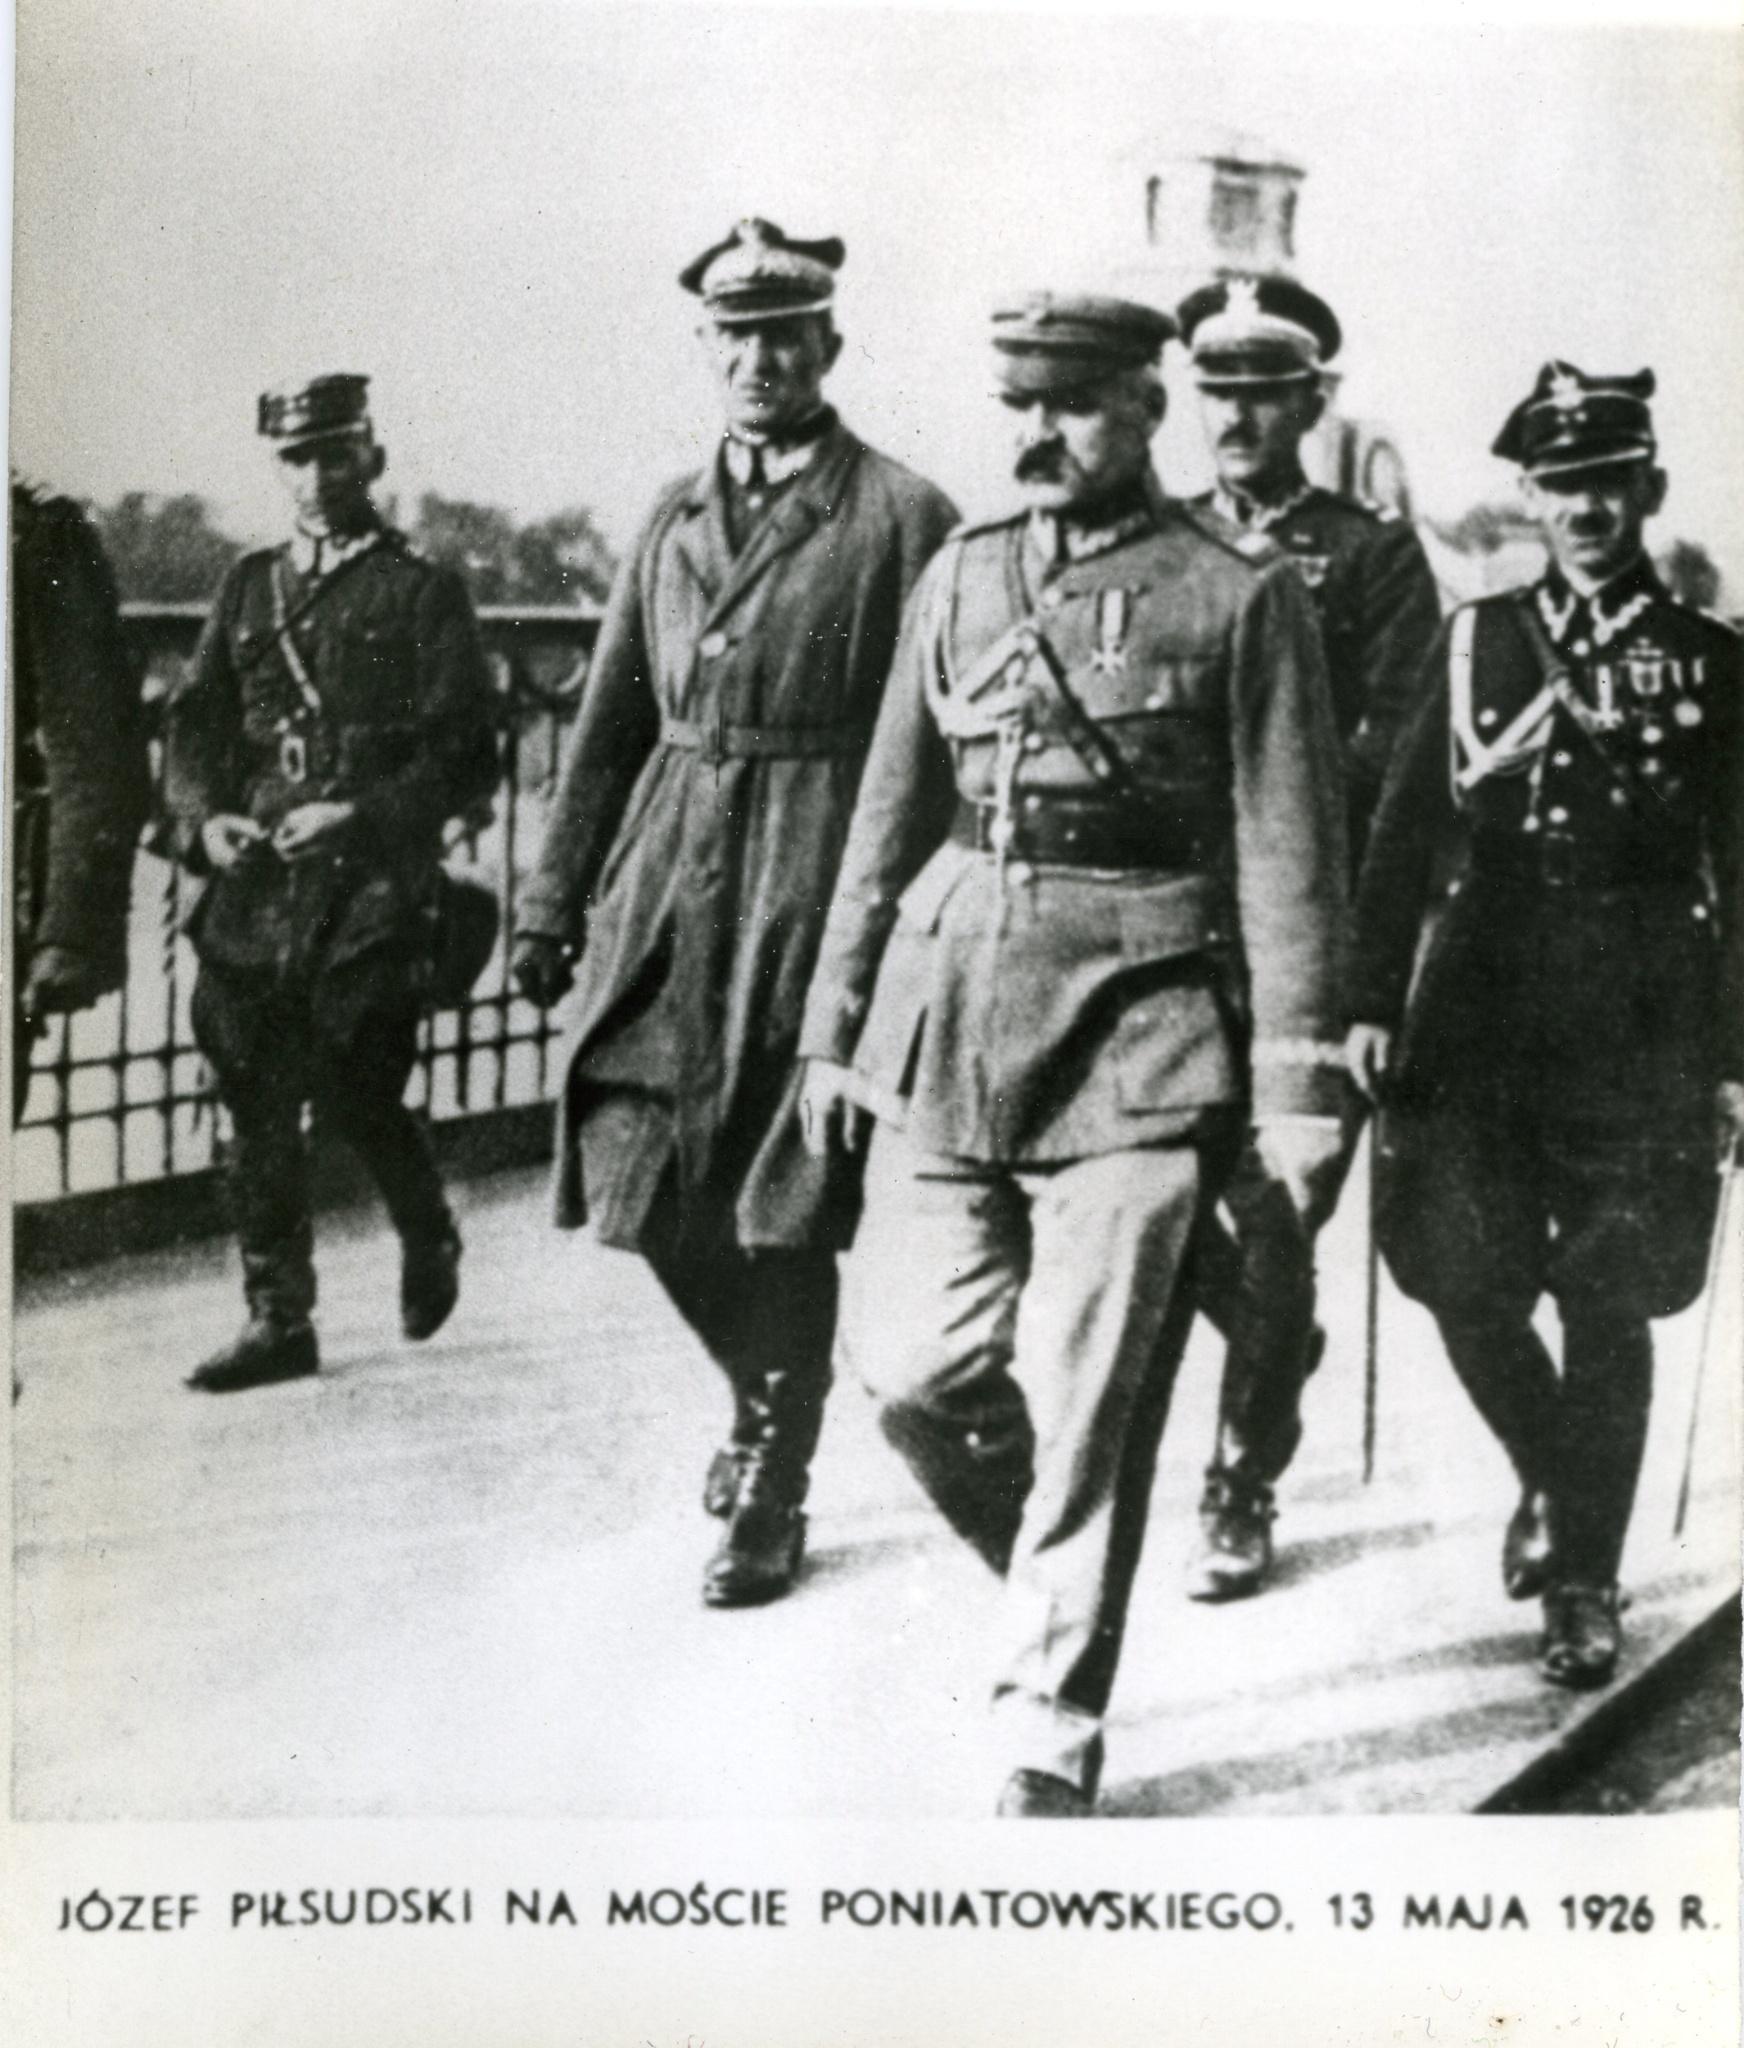 <div class='inner-box'><div class='close-desc'></div><span class='opis'>J&oacute;zef Piłsudski na Moście Poniatowskiego w Warszawie. 13 maja 1926</span><div class='clearfix'></div><span>Sygn. FIL03172</span><div class='clearfix'></div><span>&copy; Instytut Literacki</span></div>